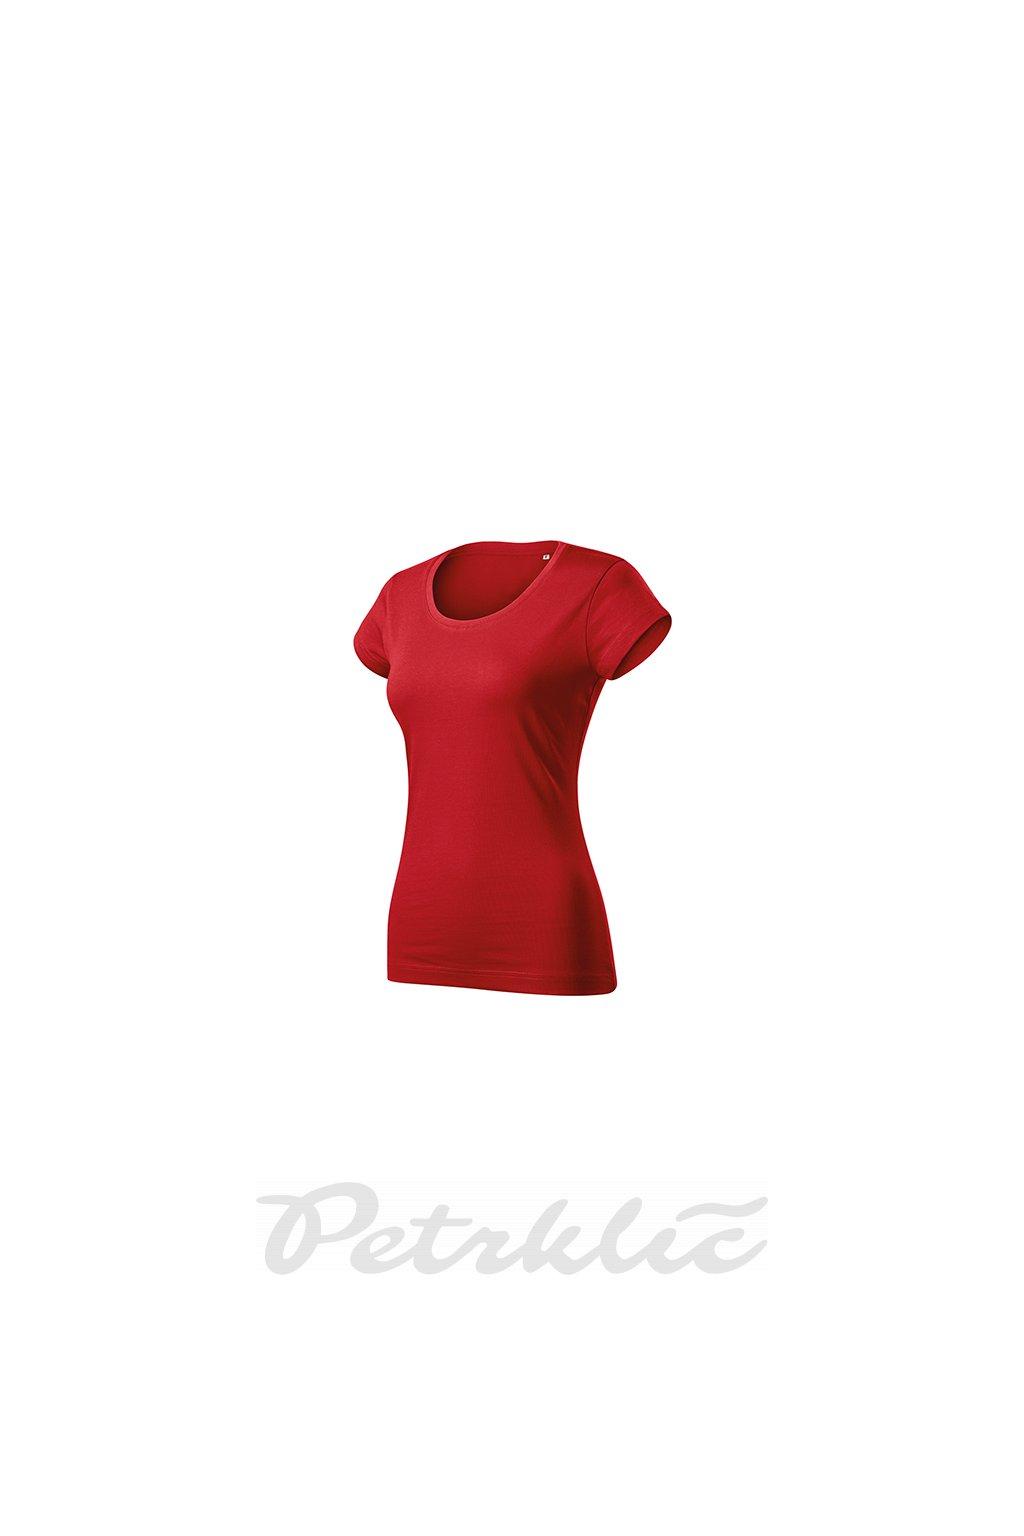 Dámské tričko ze 100% bavlny Viper Free